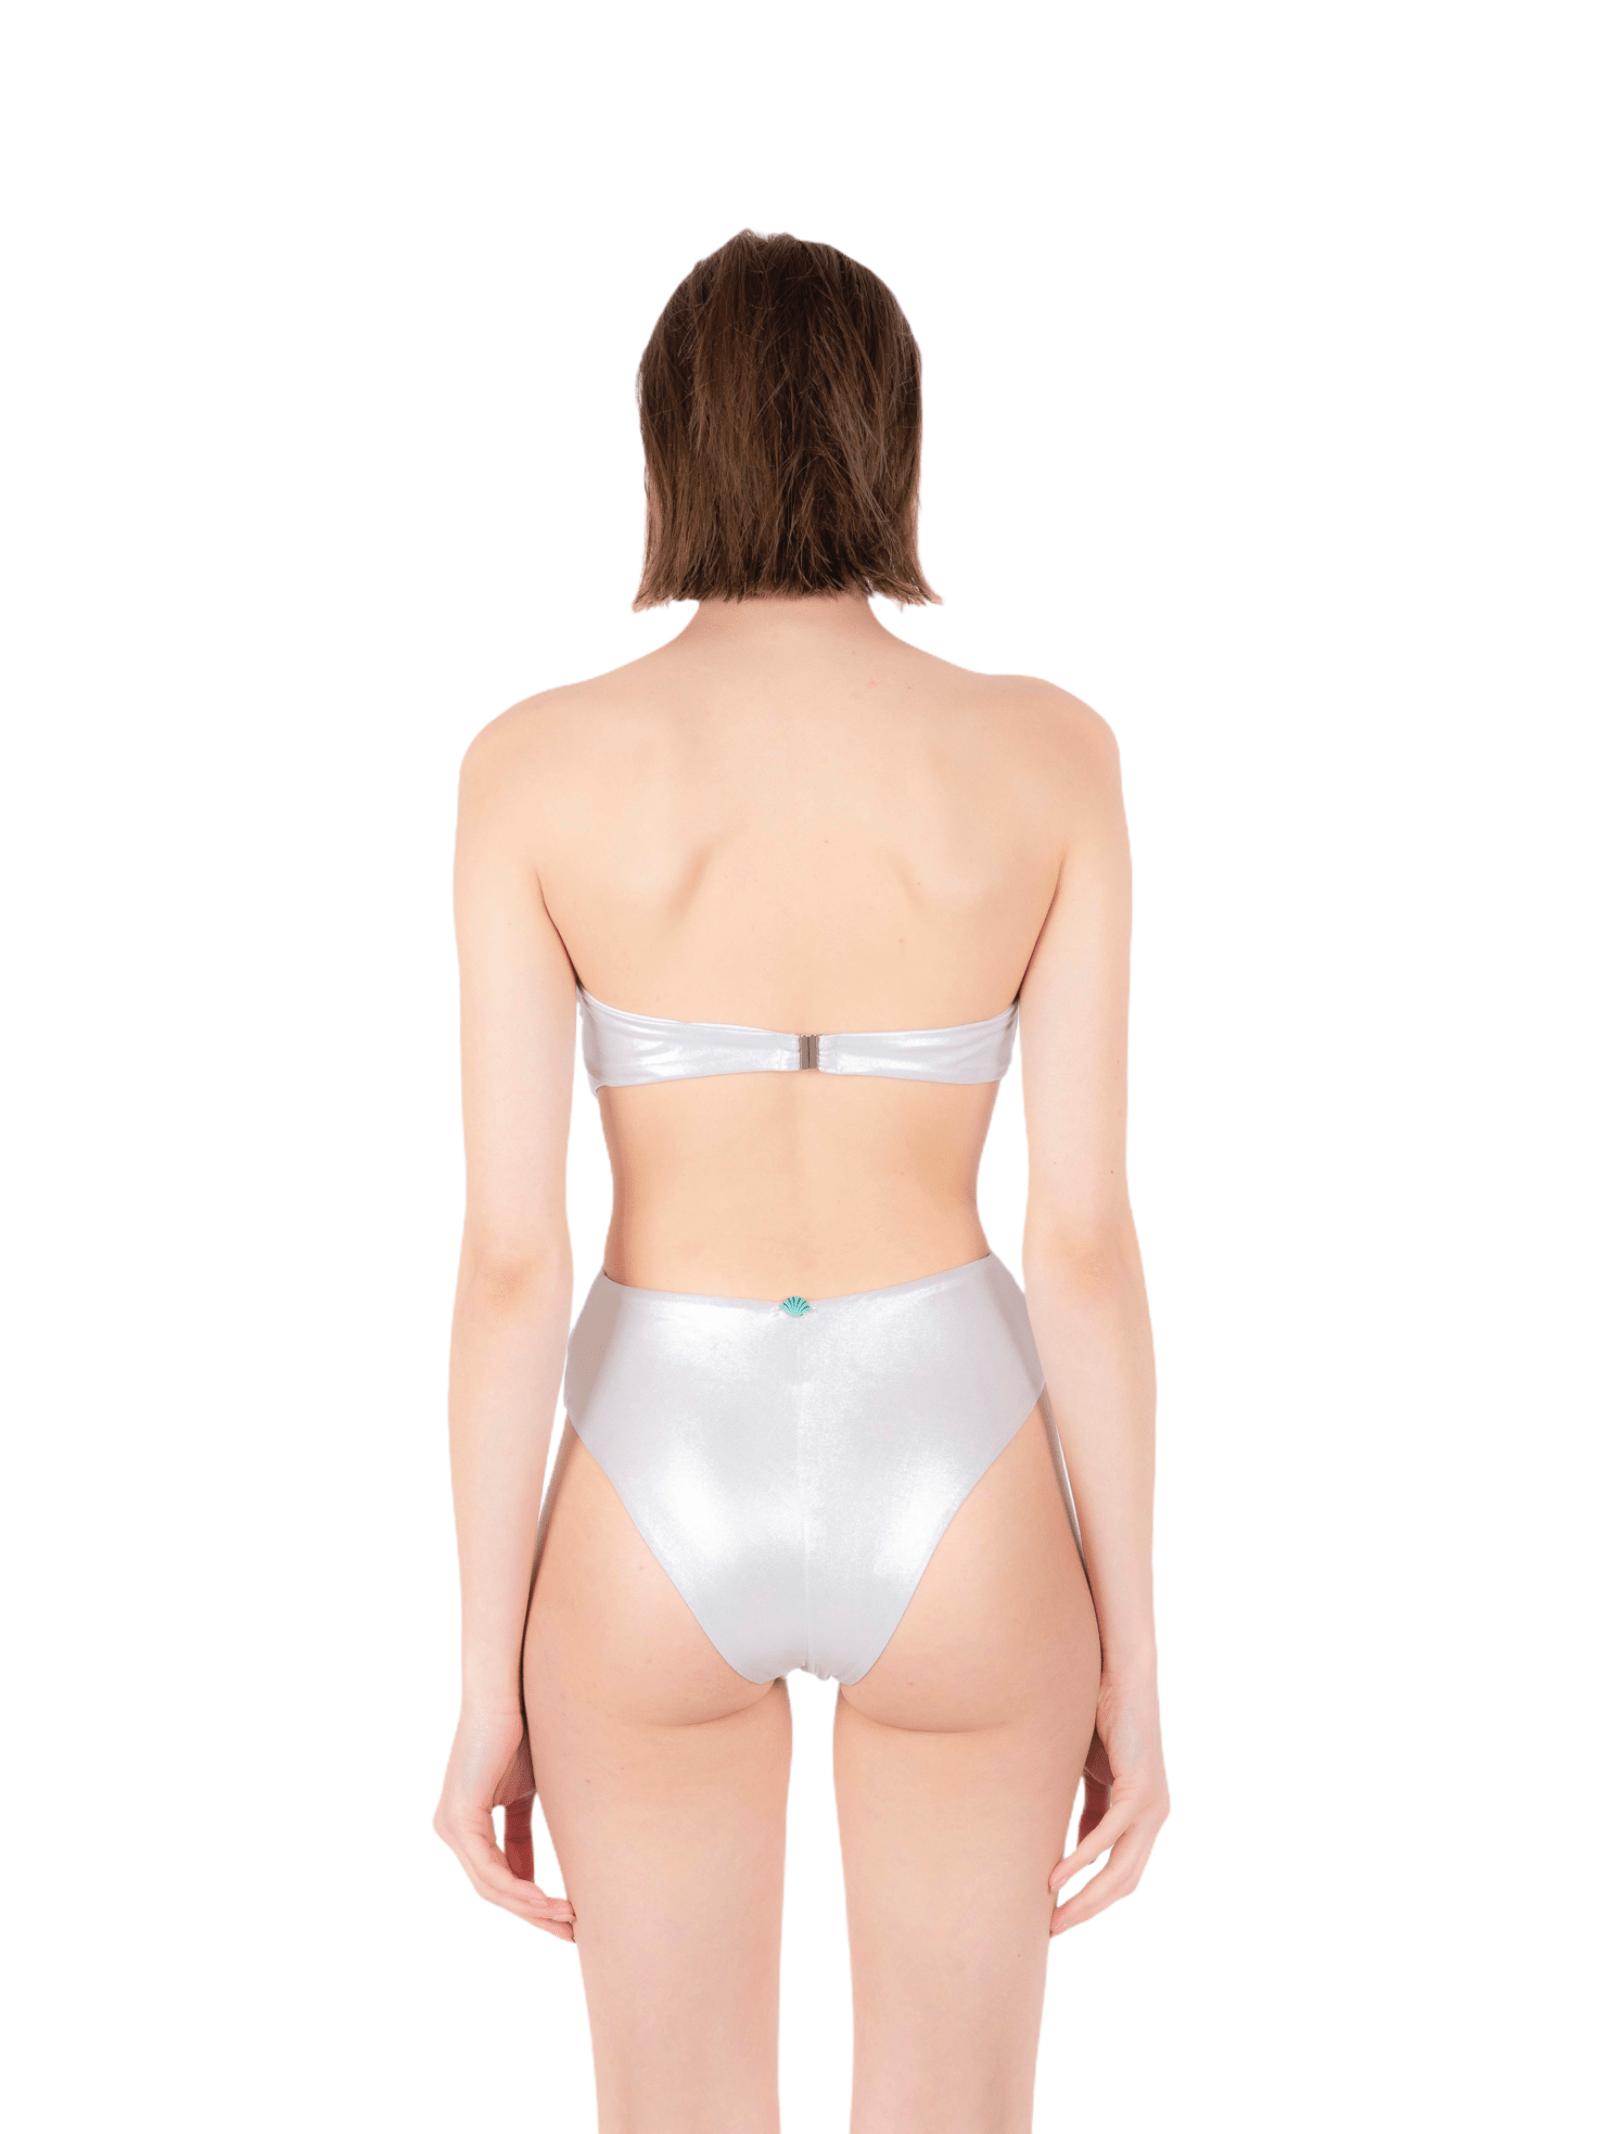 Bikini top with high slip ANNAMARE   23   BK-109BIANCO